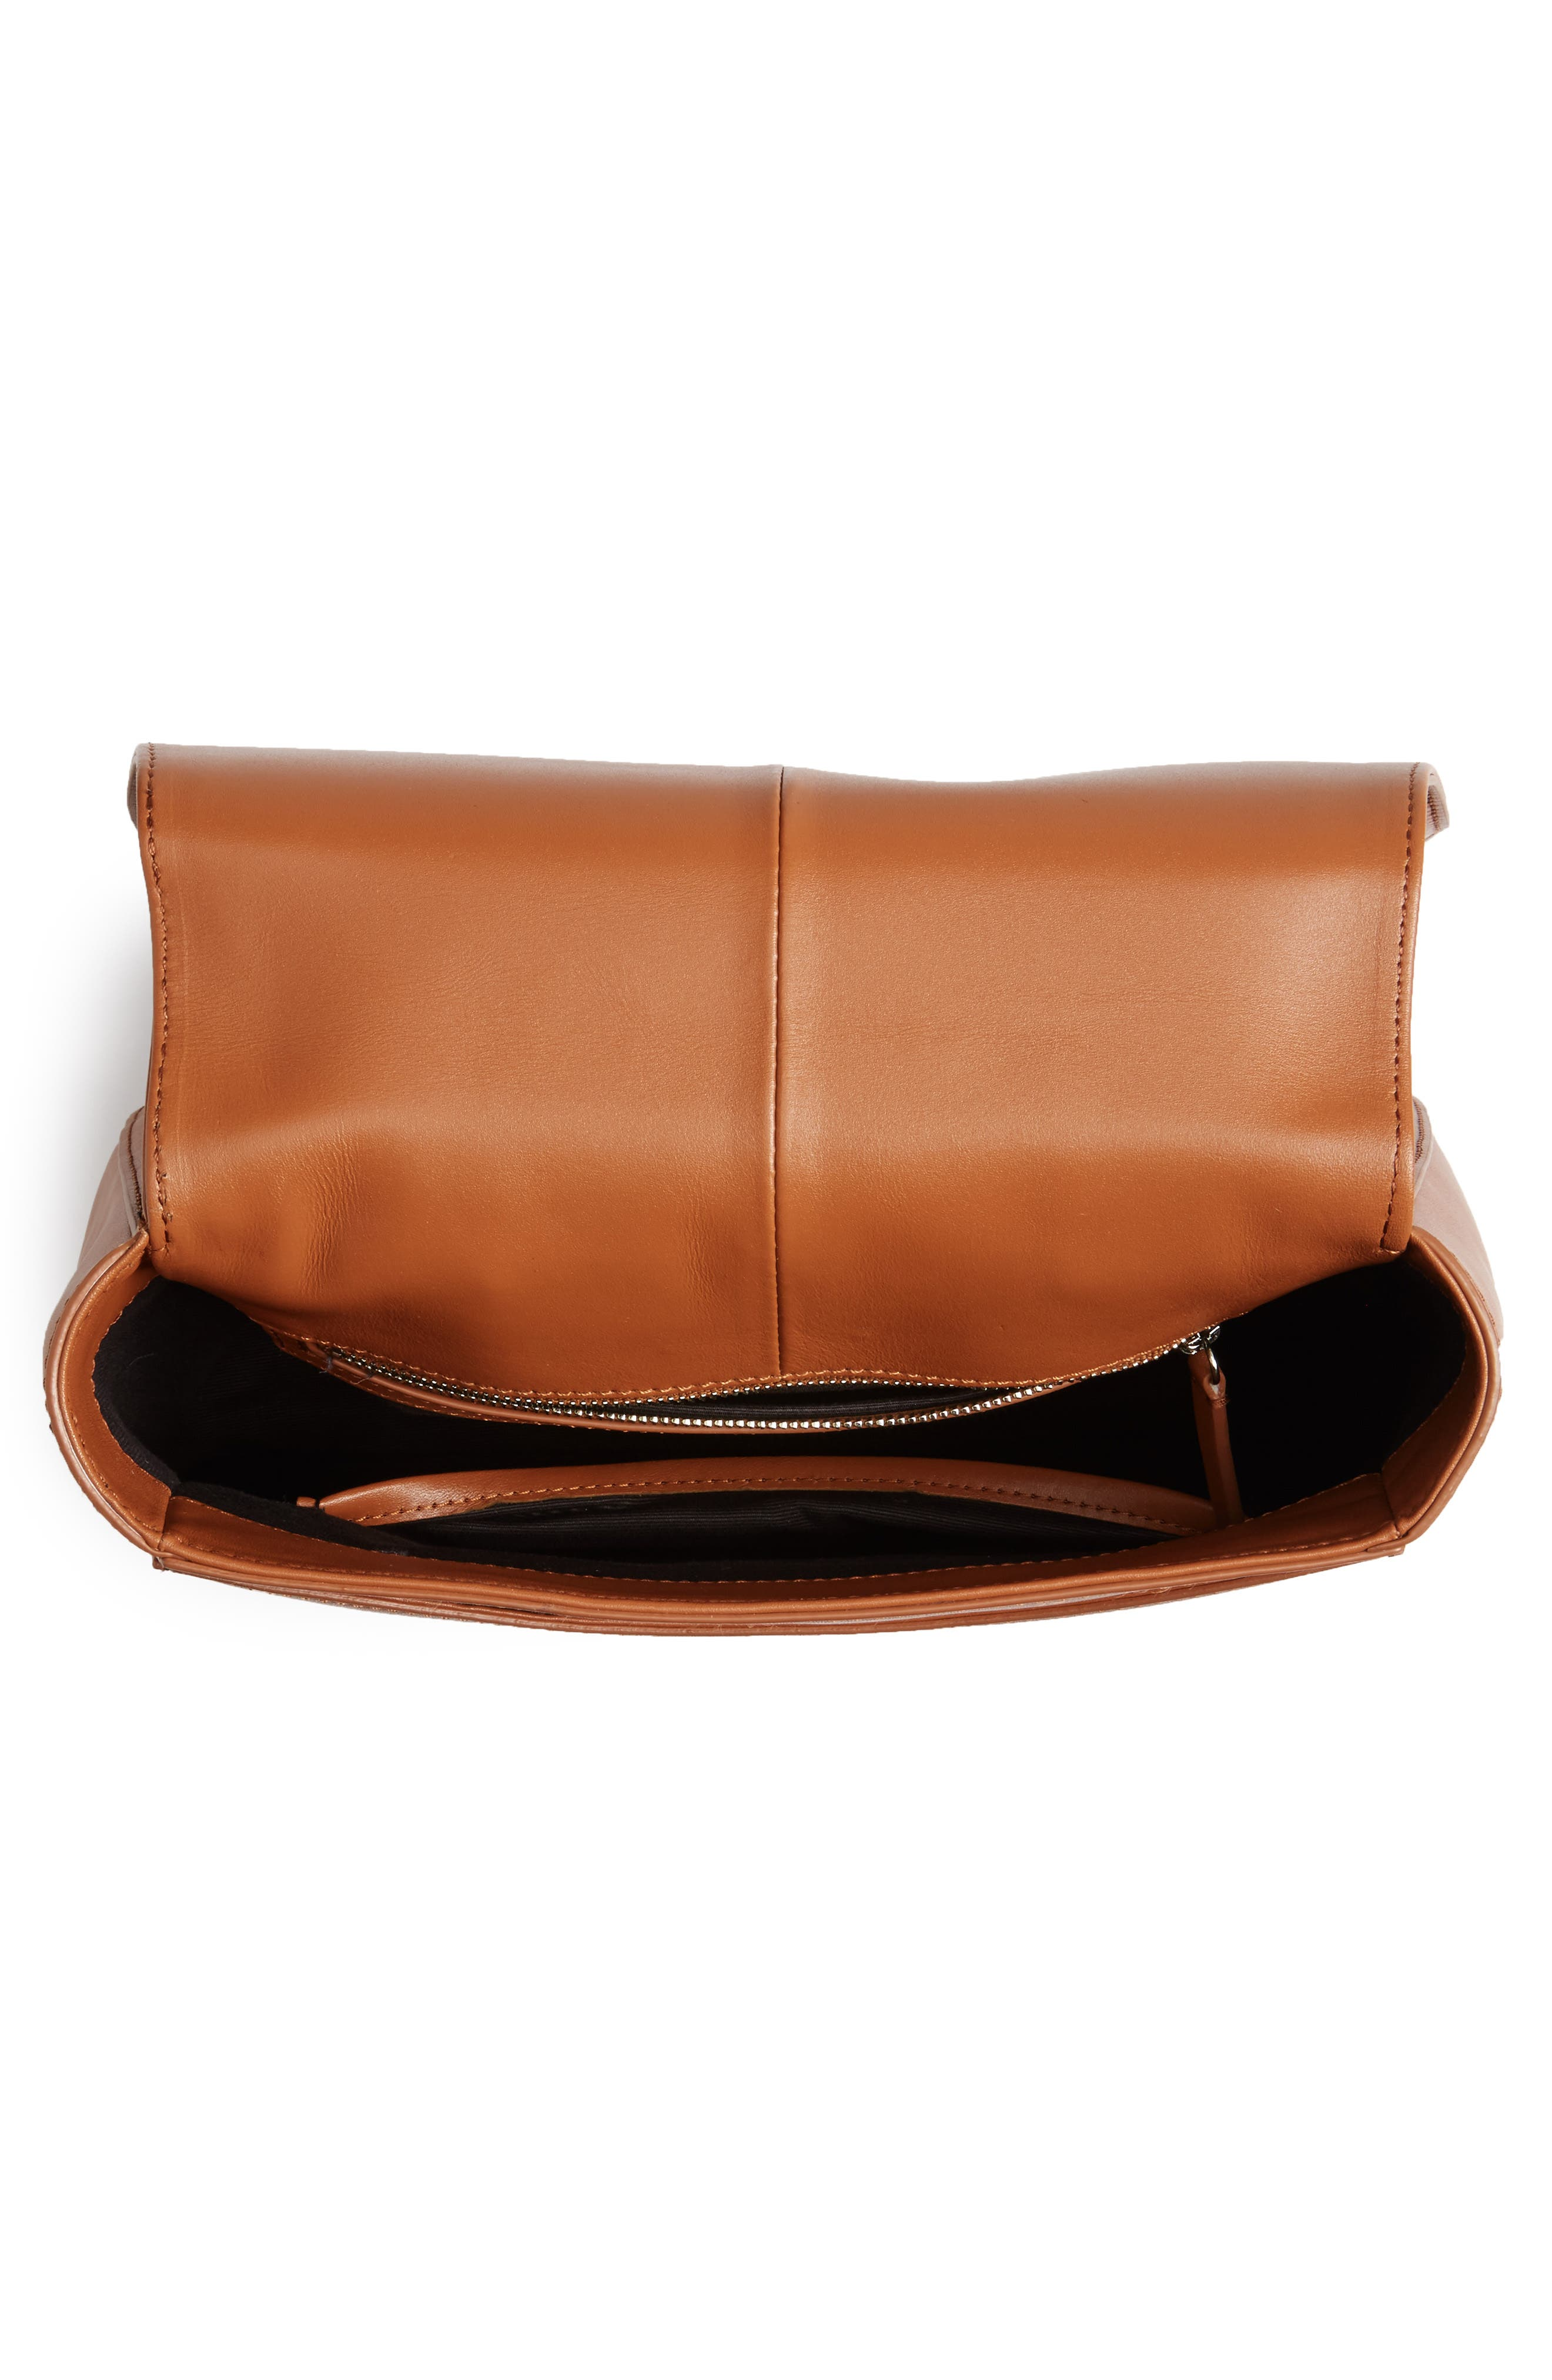 Kate Calfskin Leather Backpack,                             Alternate thumbnail 4, color,                             200